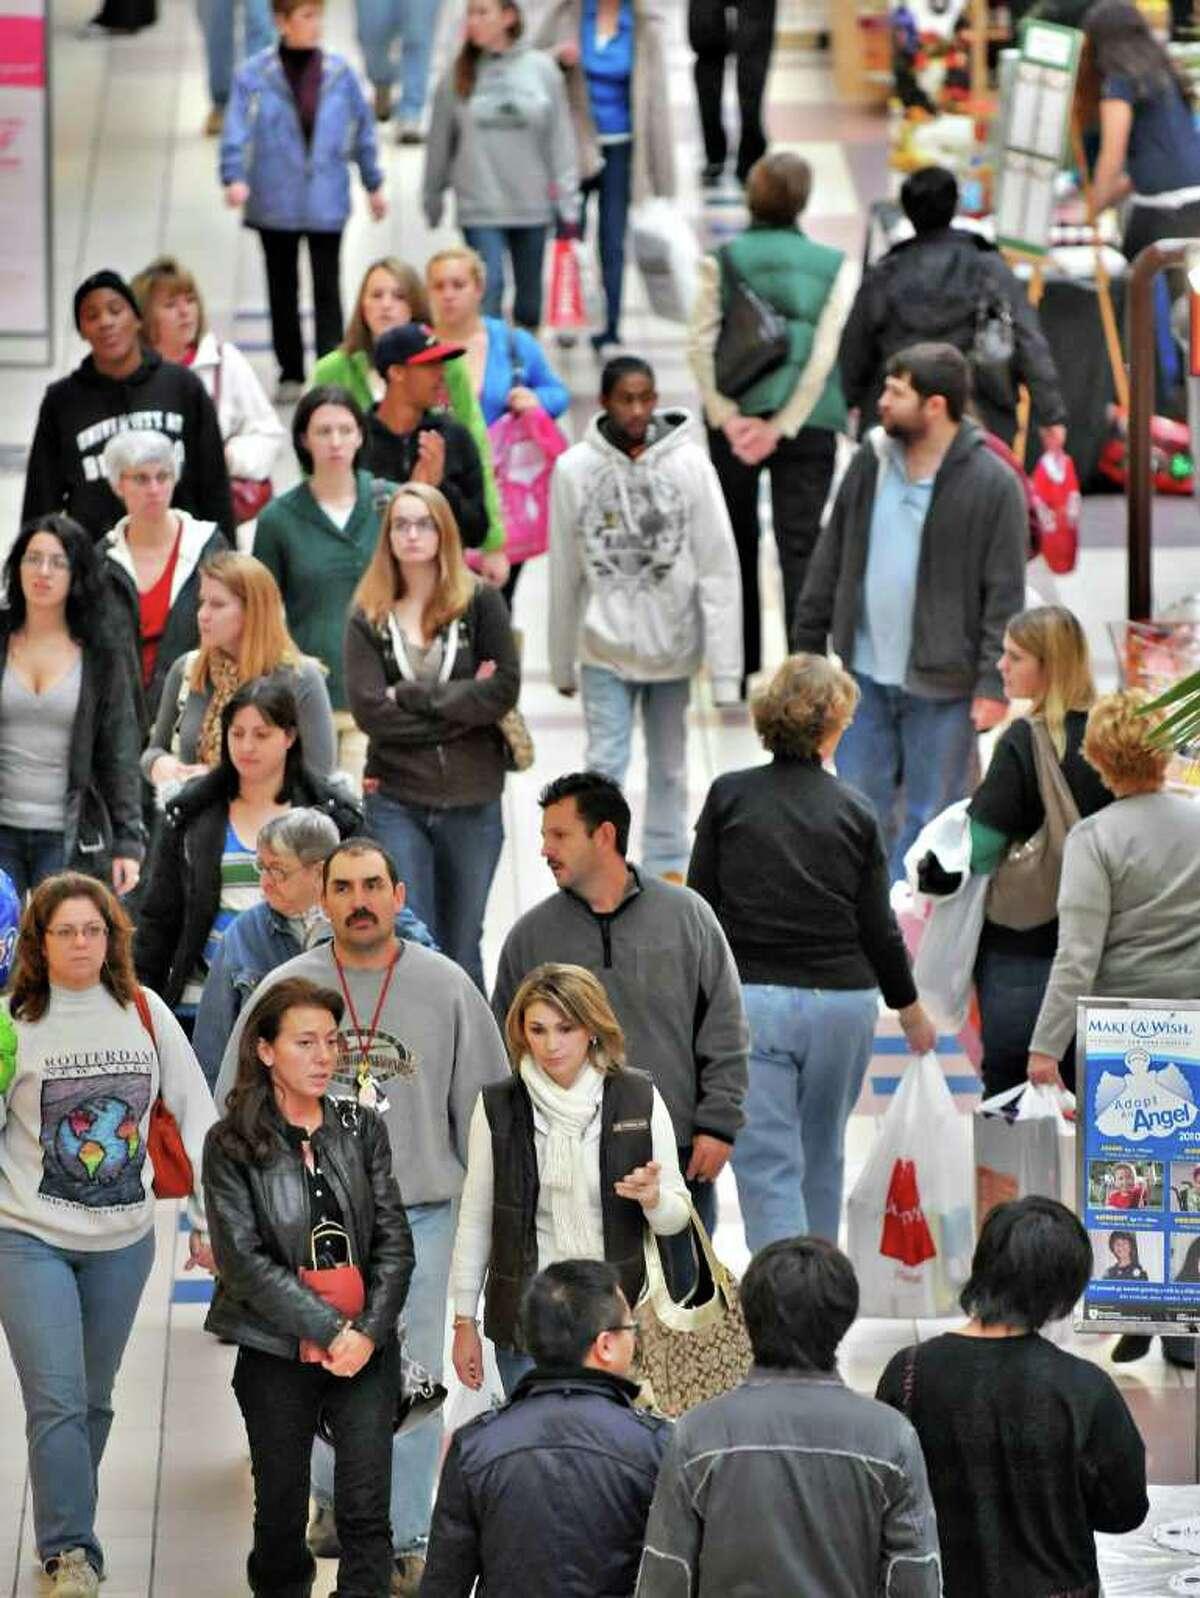 Black Friday shoppers inside Crossgates Mall late Friday morning, Nov. 26.. (John Carl D'Annibale / Times Union)